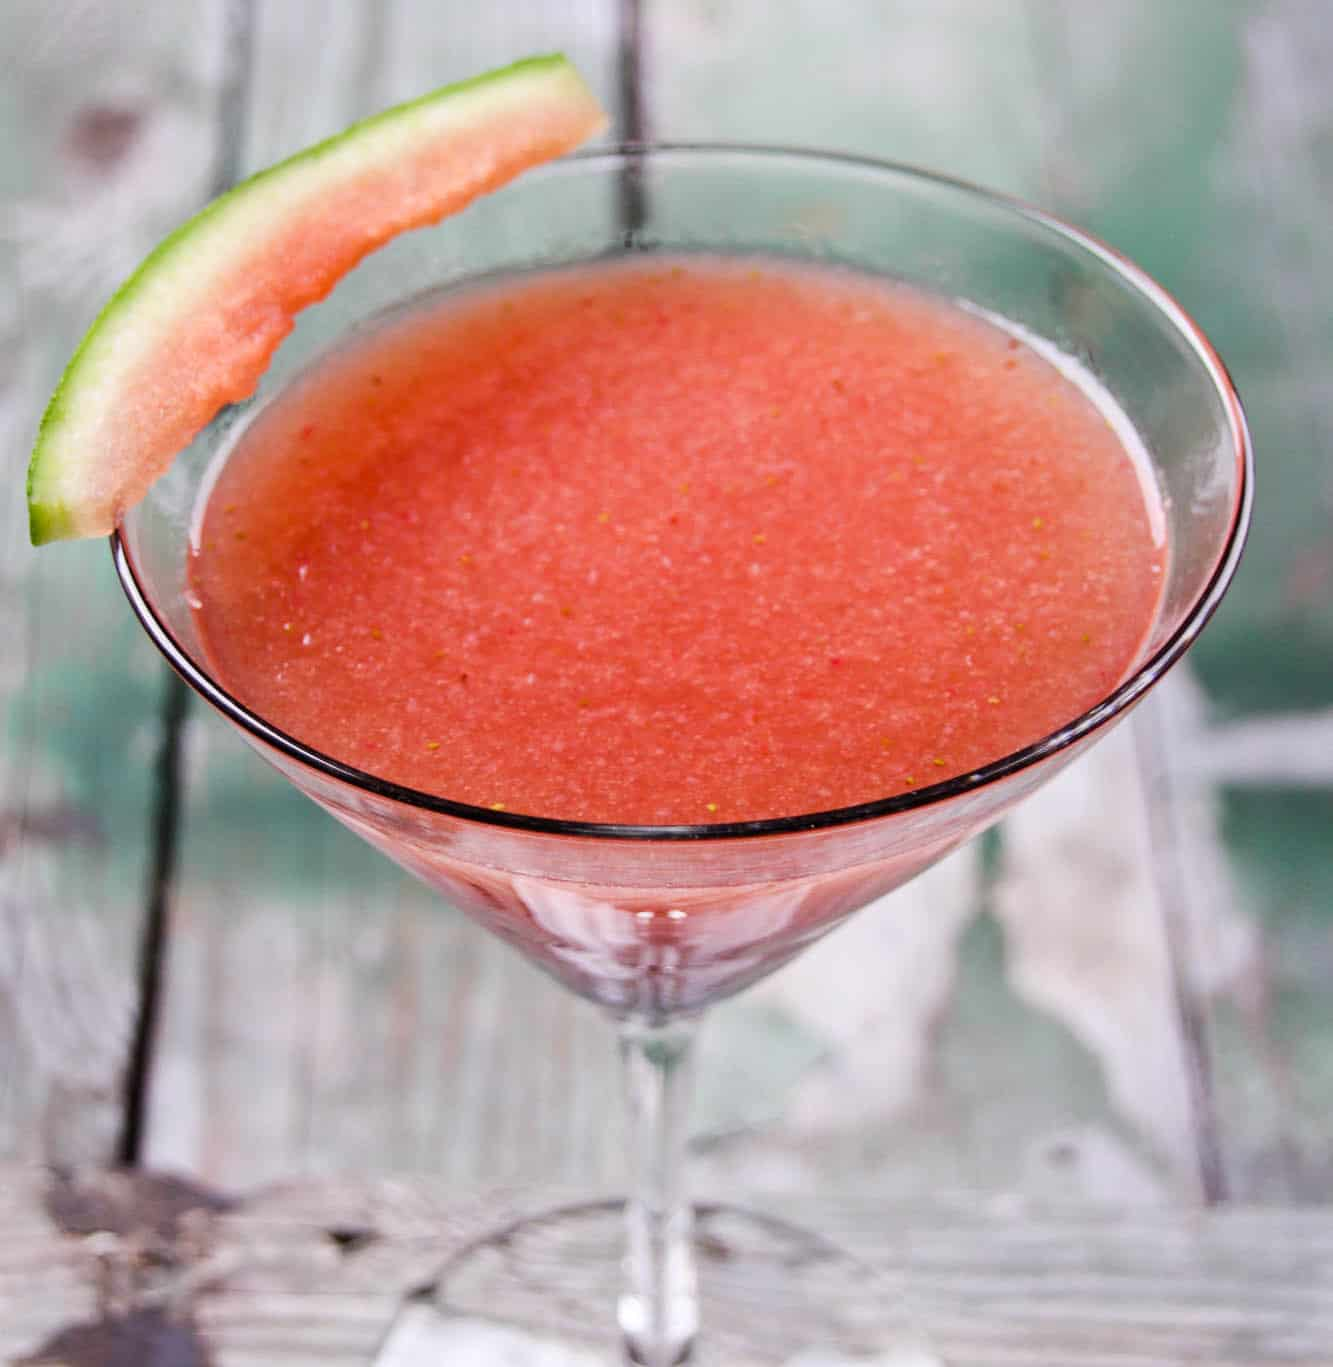 Fullsize Of Watermelon Vodka Drink